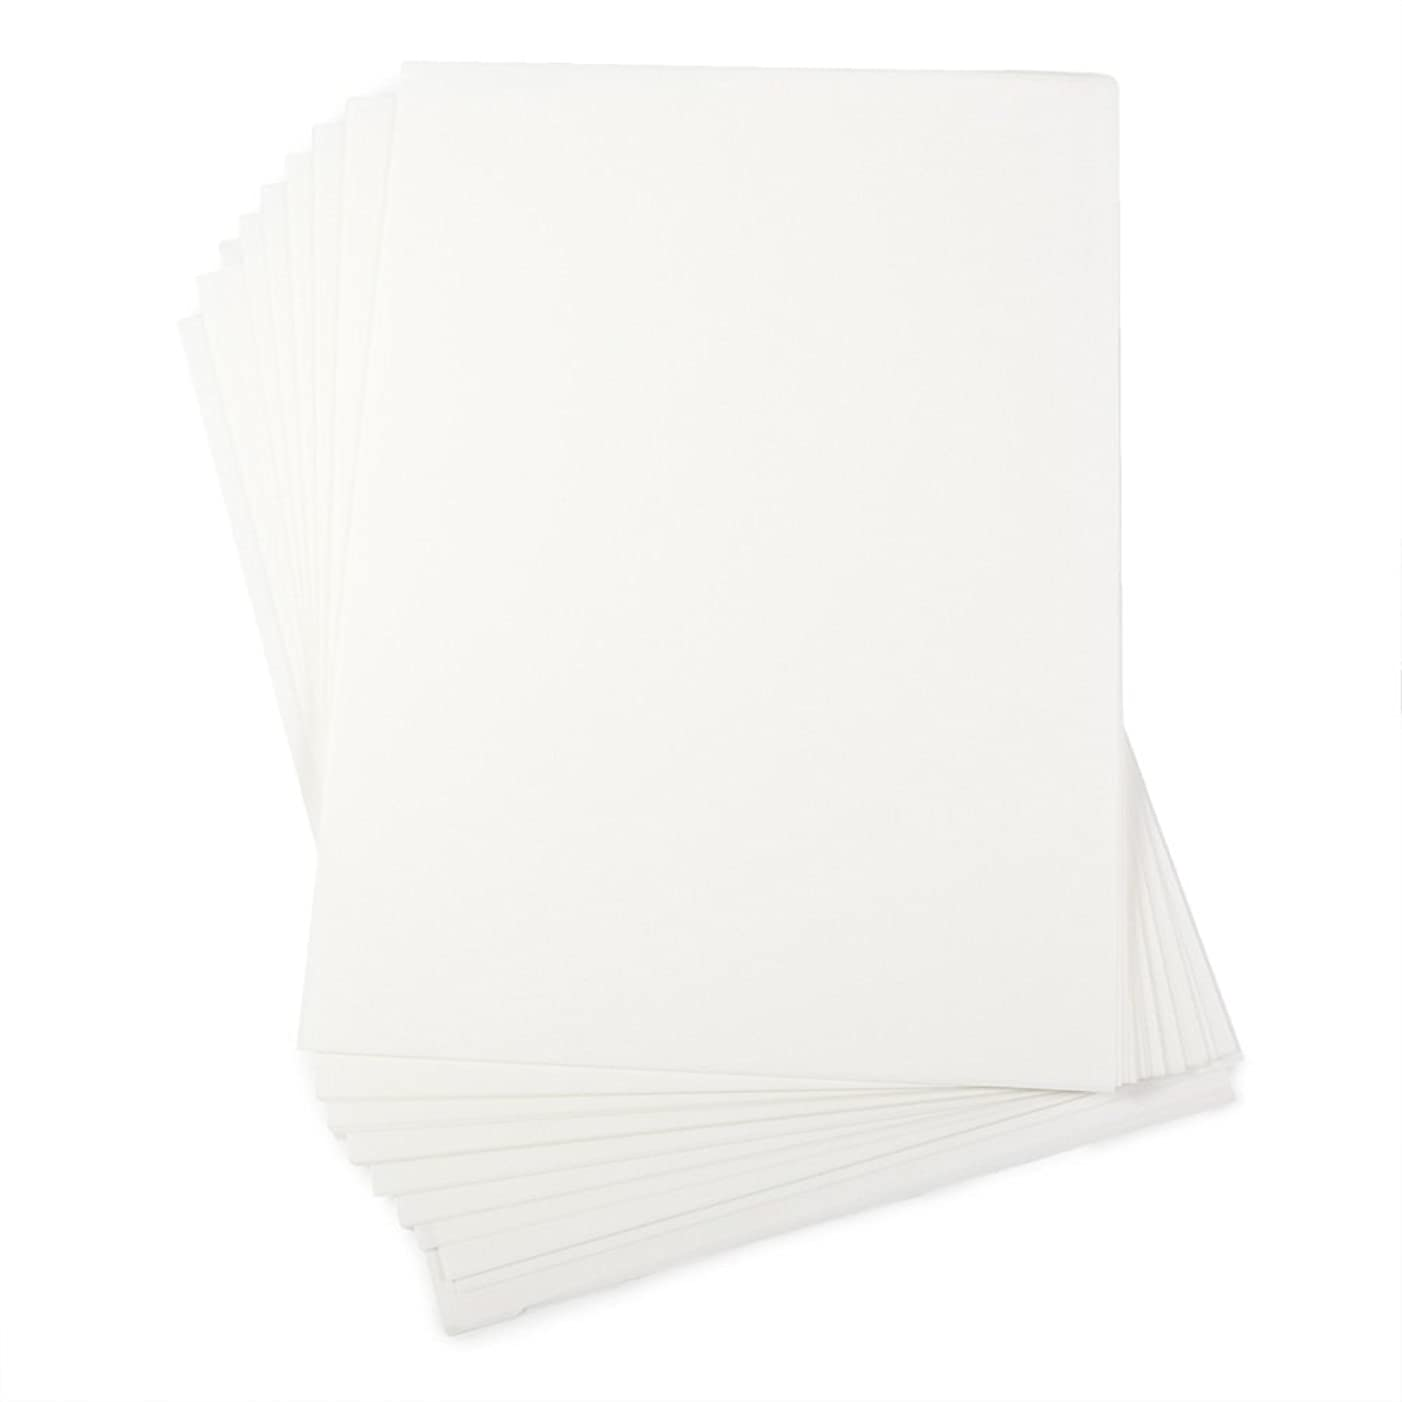 CISinks 50 Sheets 11